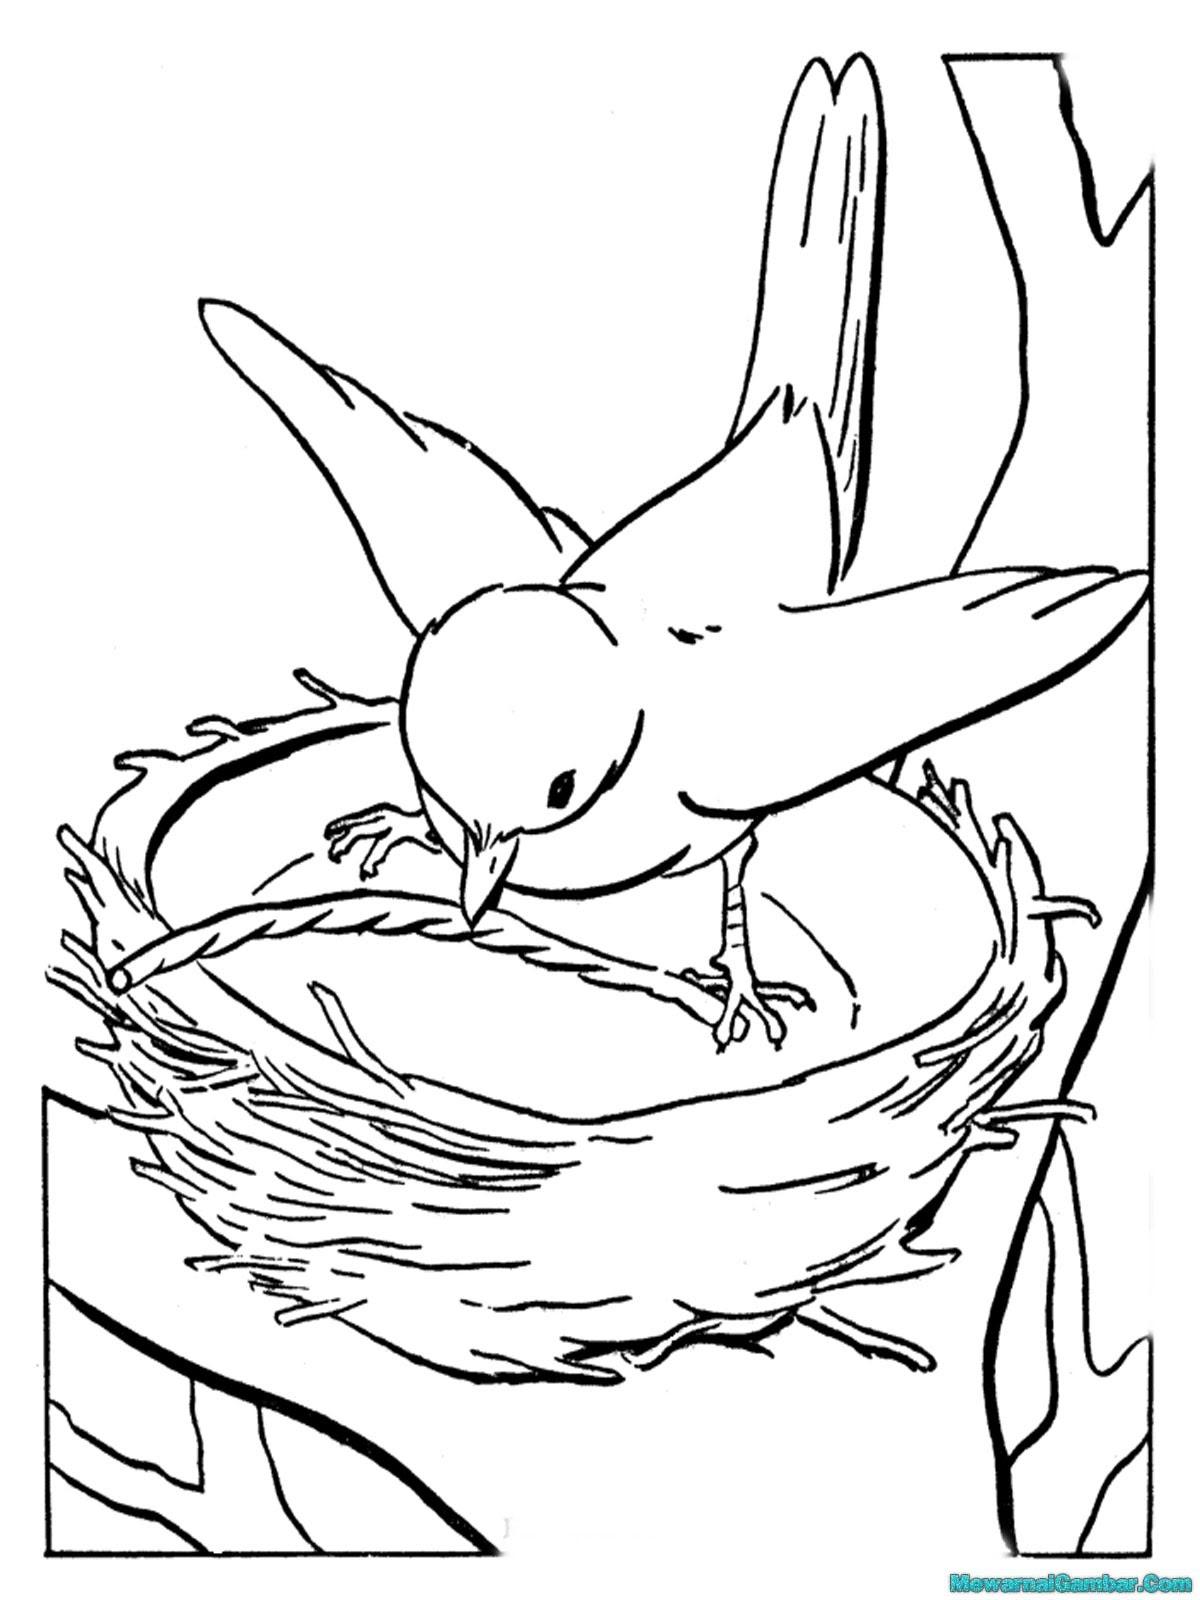 Mewarnai Gambar Burung Terbang